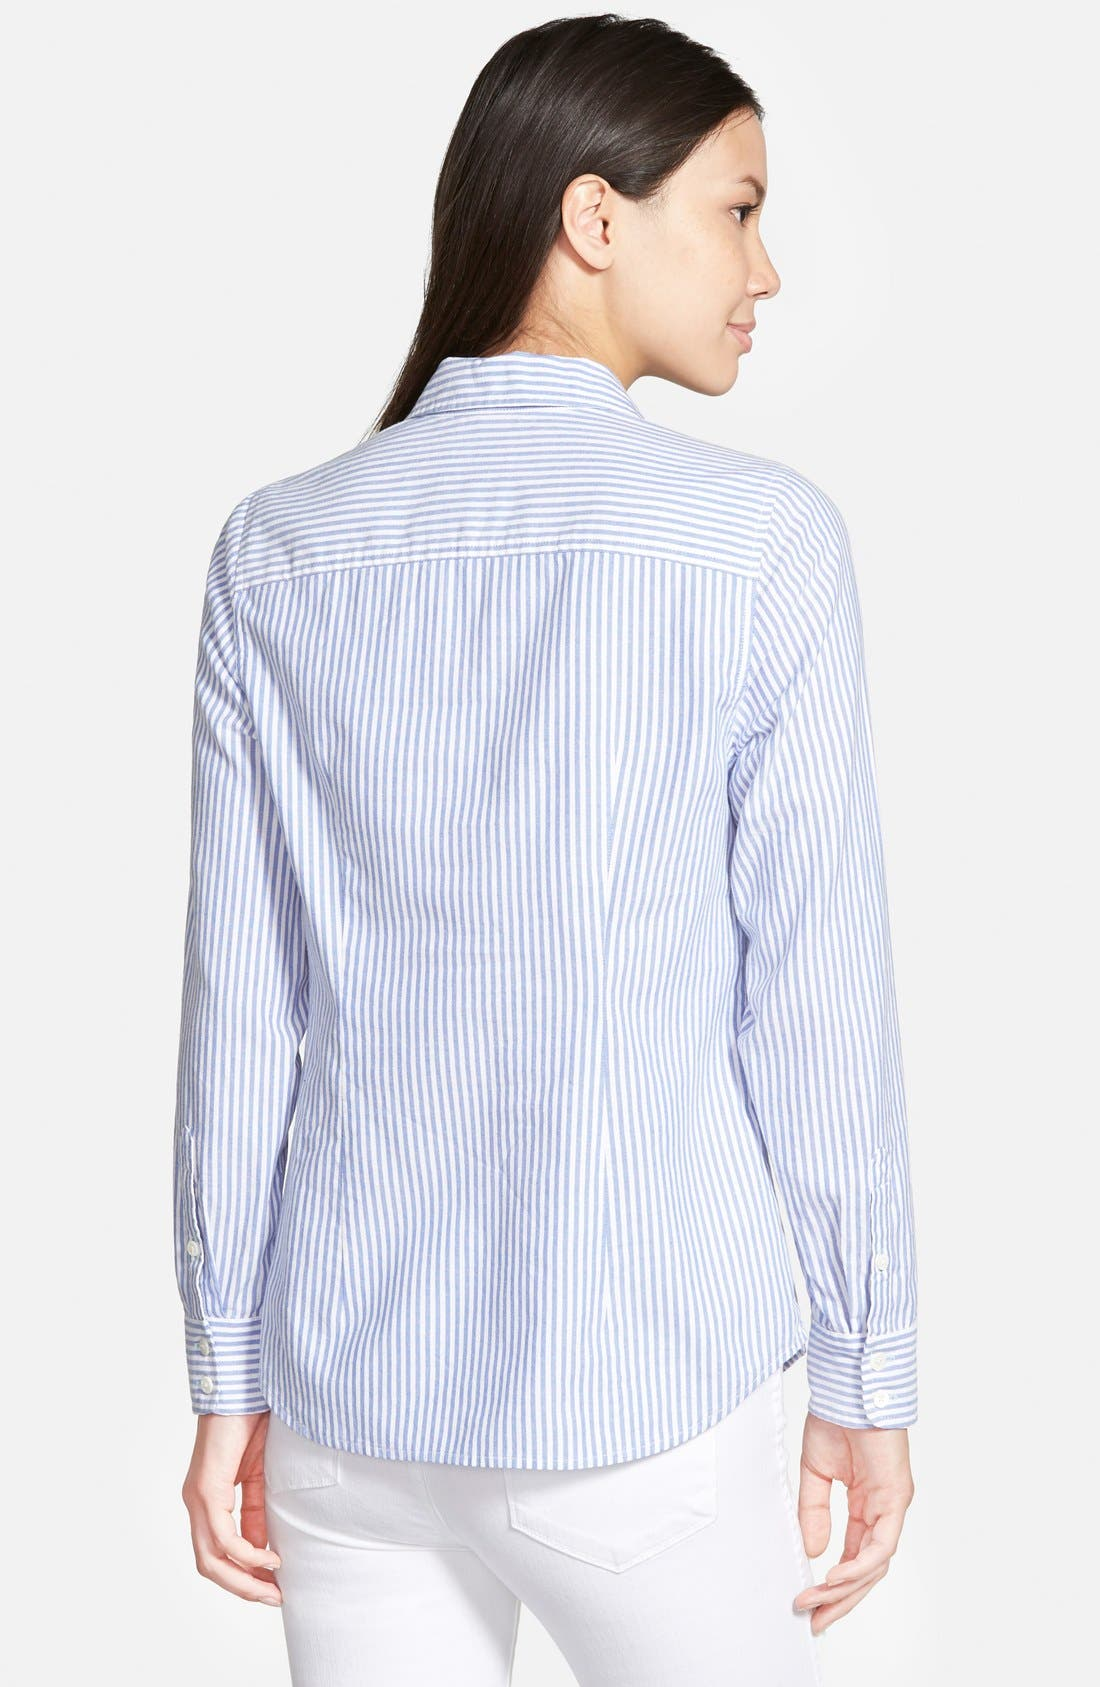 Alternate Image 2  - Vineyard Vines Oxford Stripe Shirt